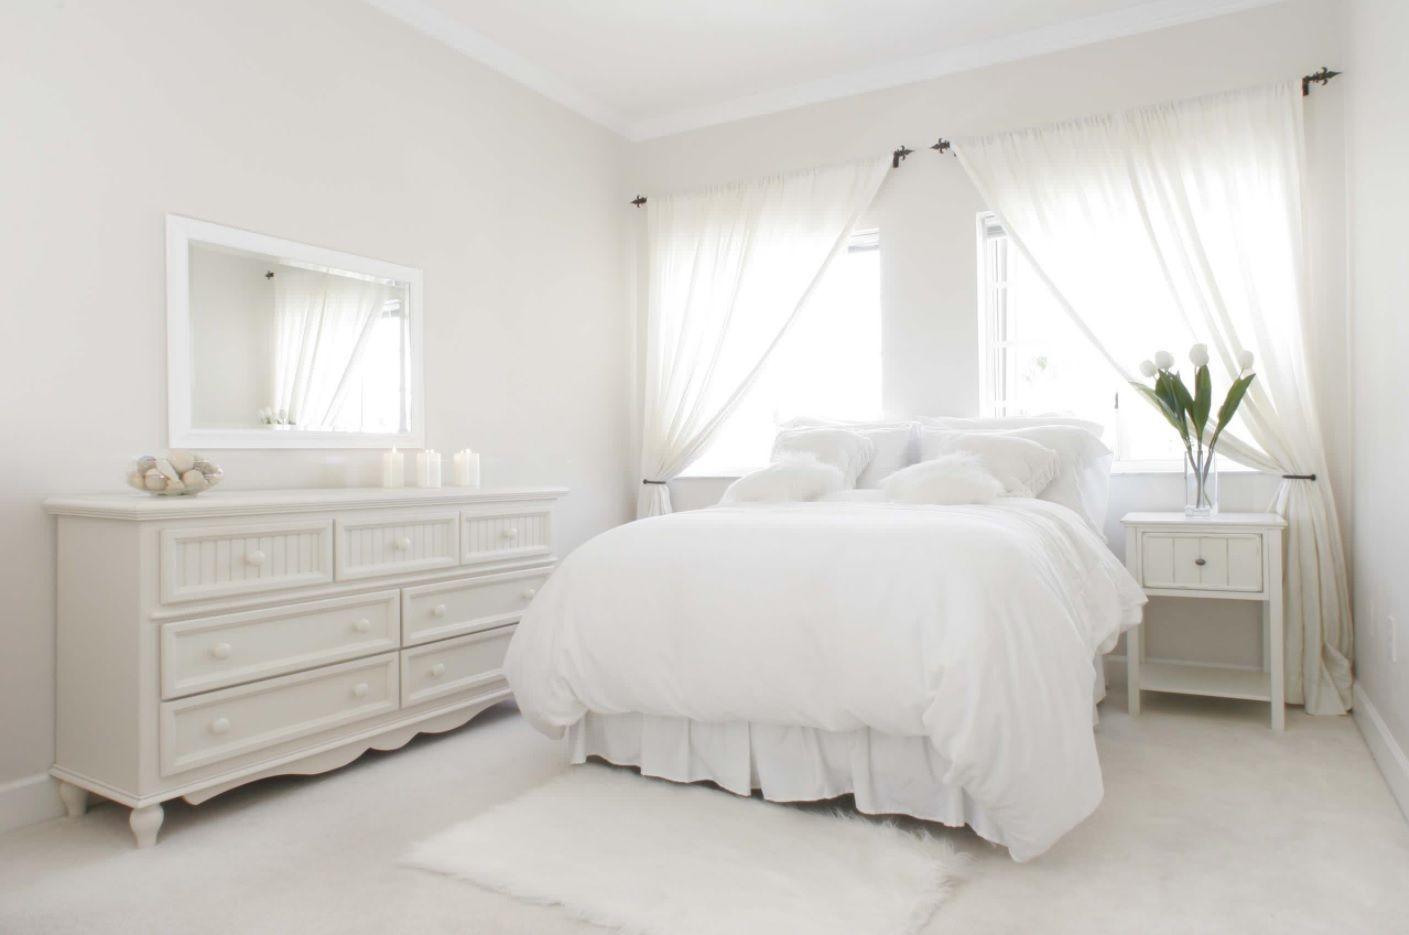 white bed set 001 - Интерьер спальни в белых тонах